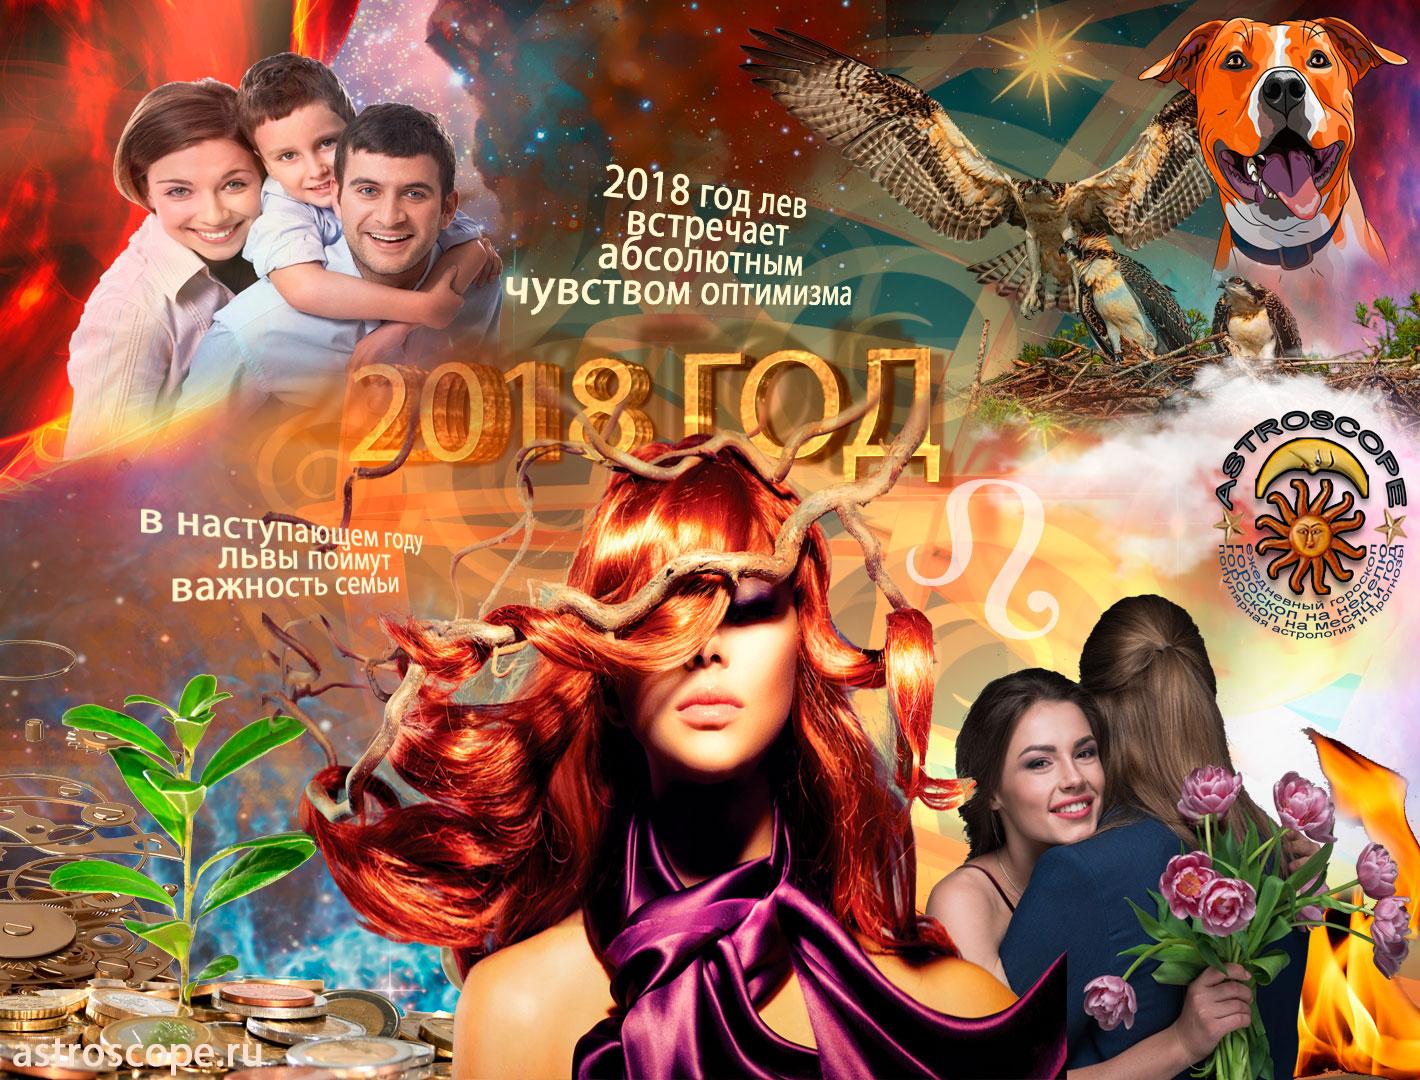 Знак Зодиака Лев: характеристика и гороскоп на 2018 год